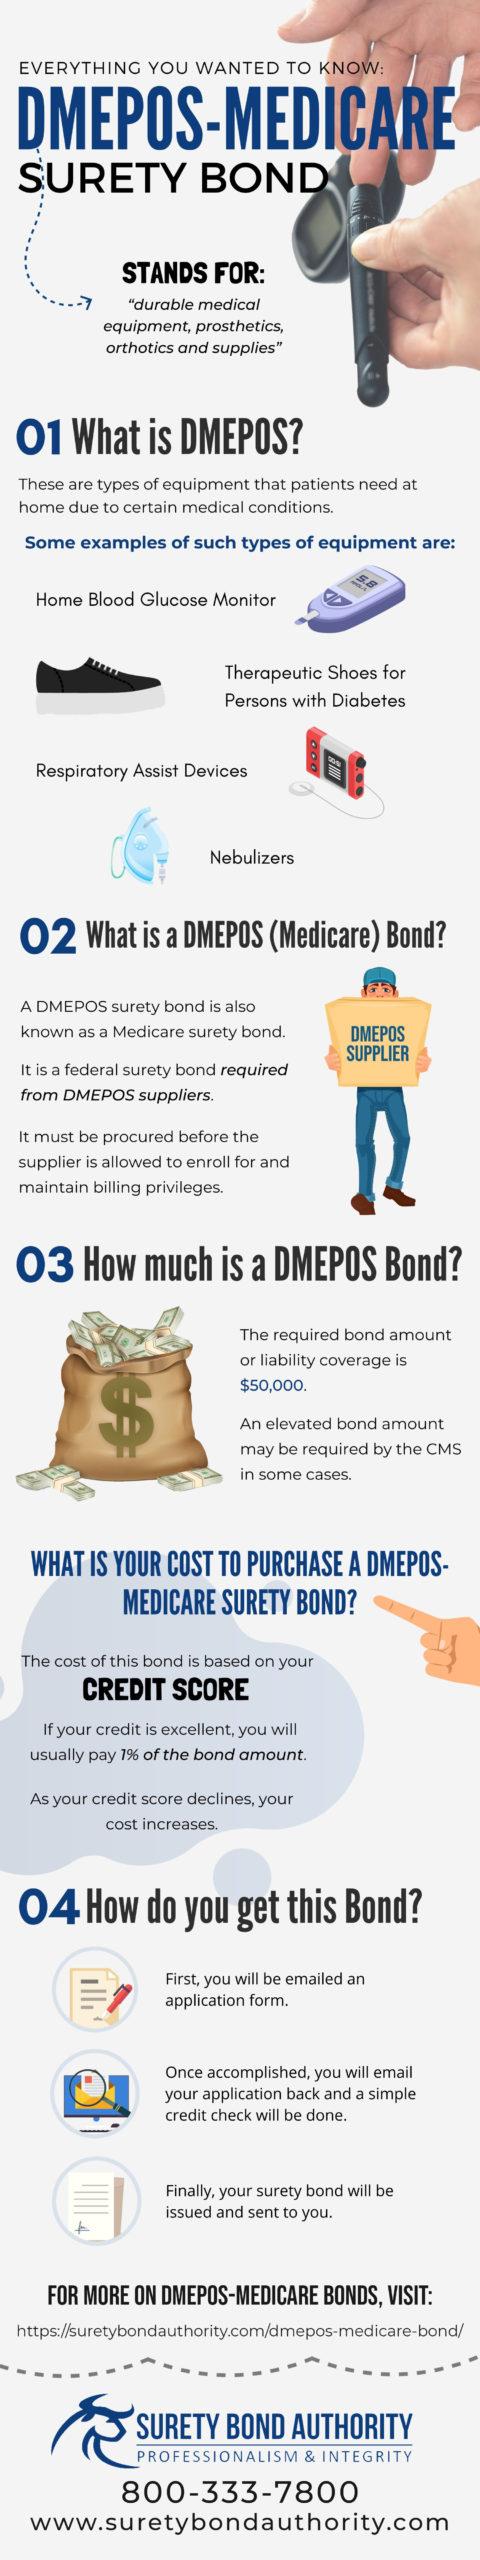 DMEPOS-Medicare Surety Bond